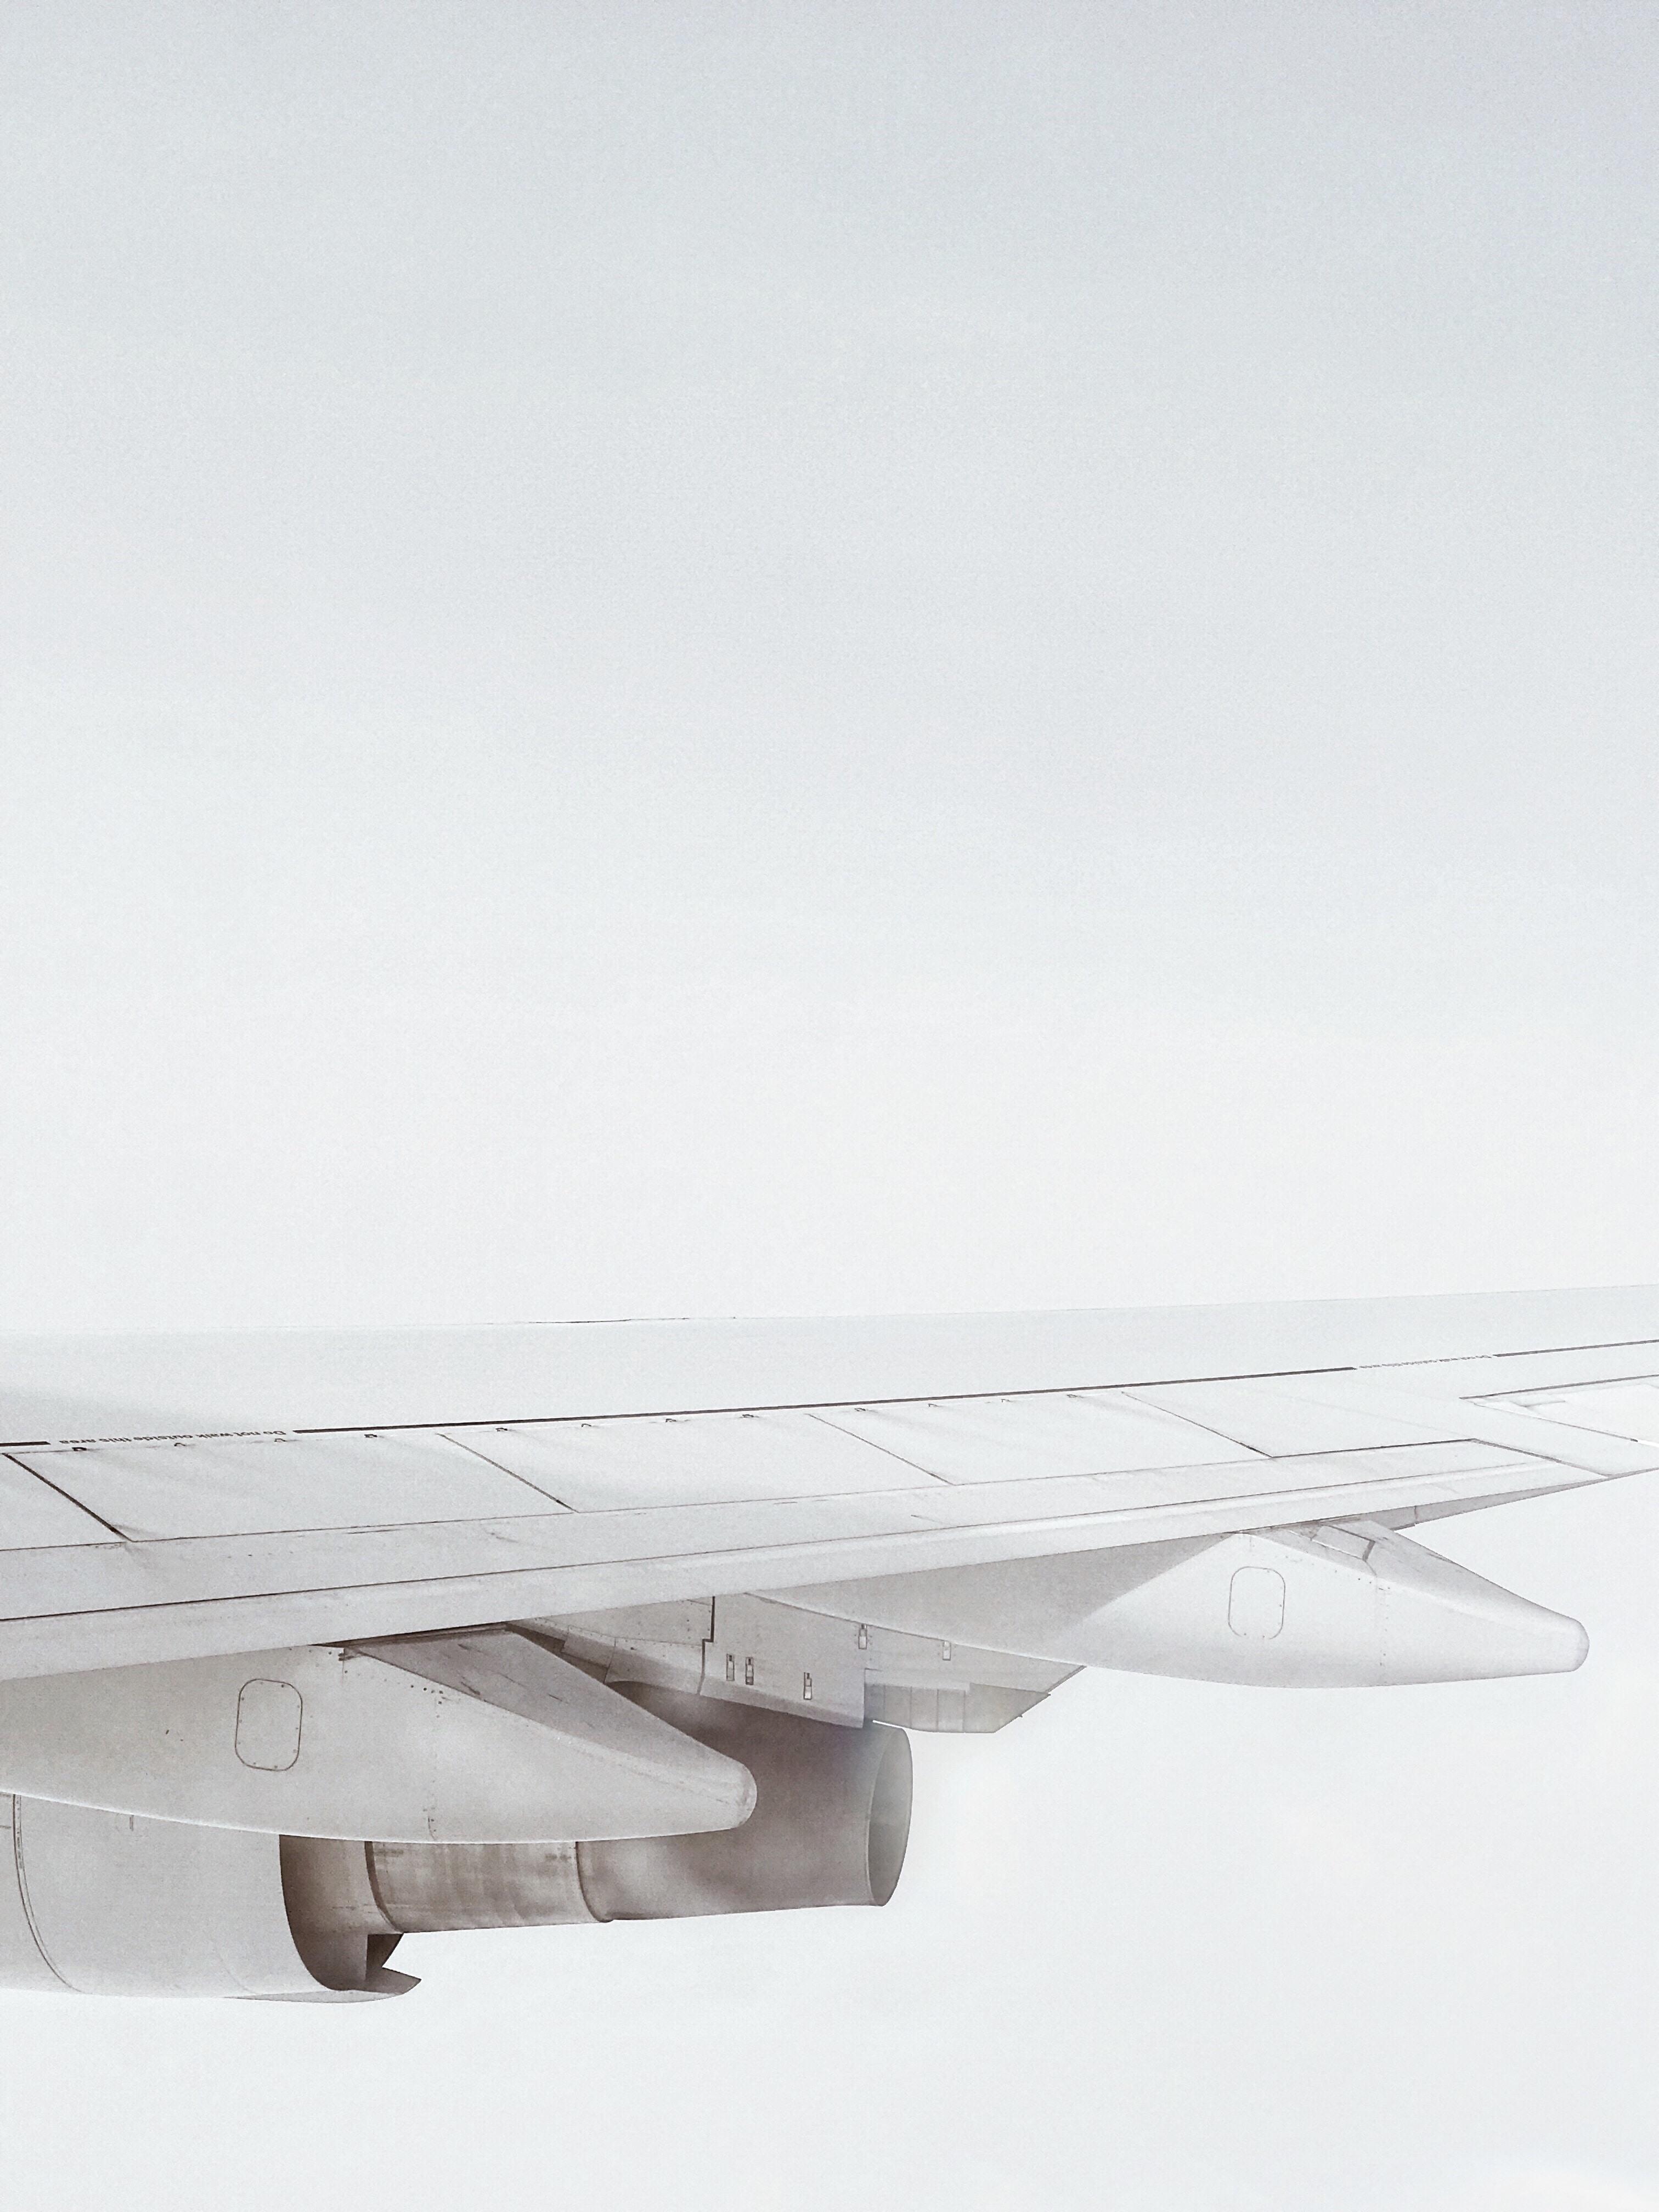 white plane wing